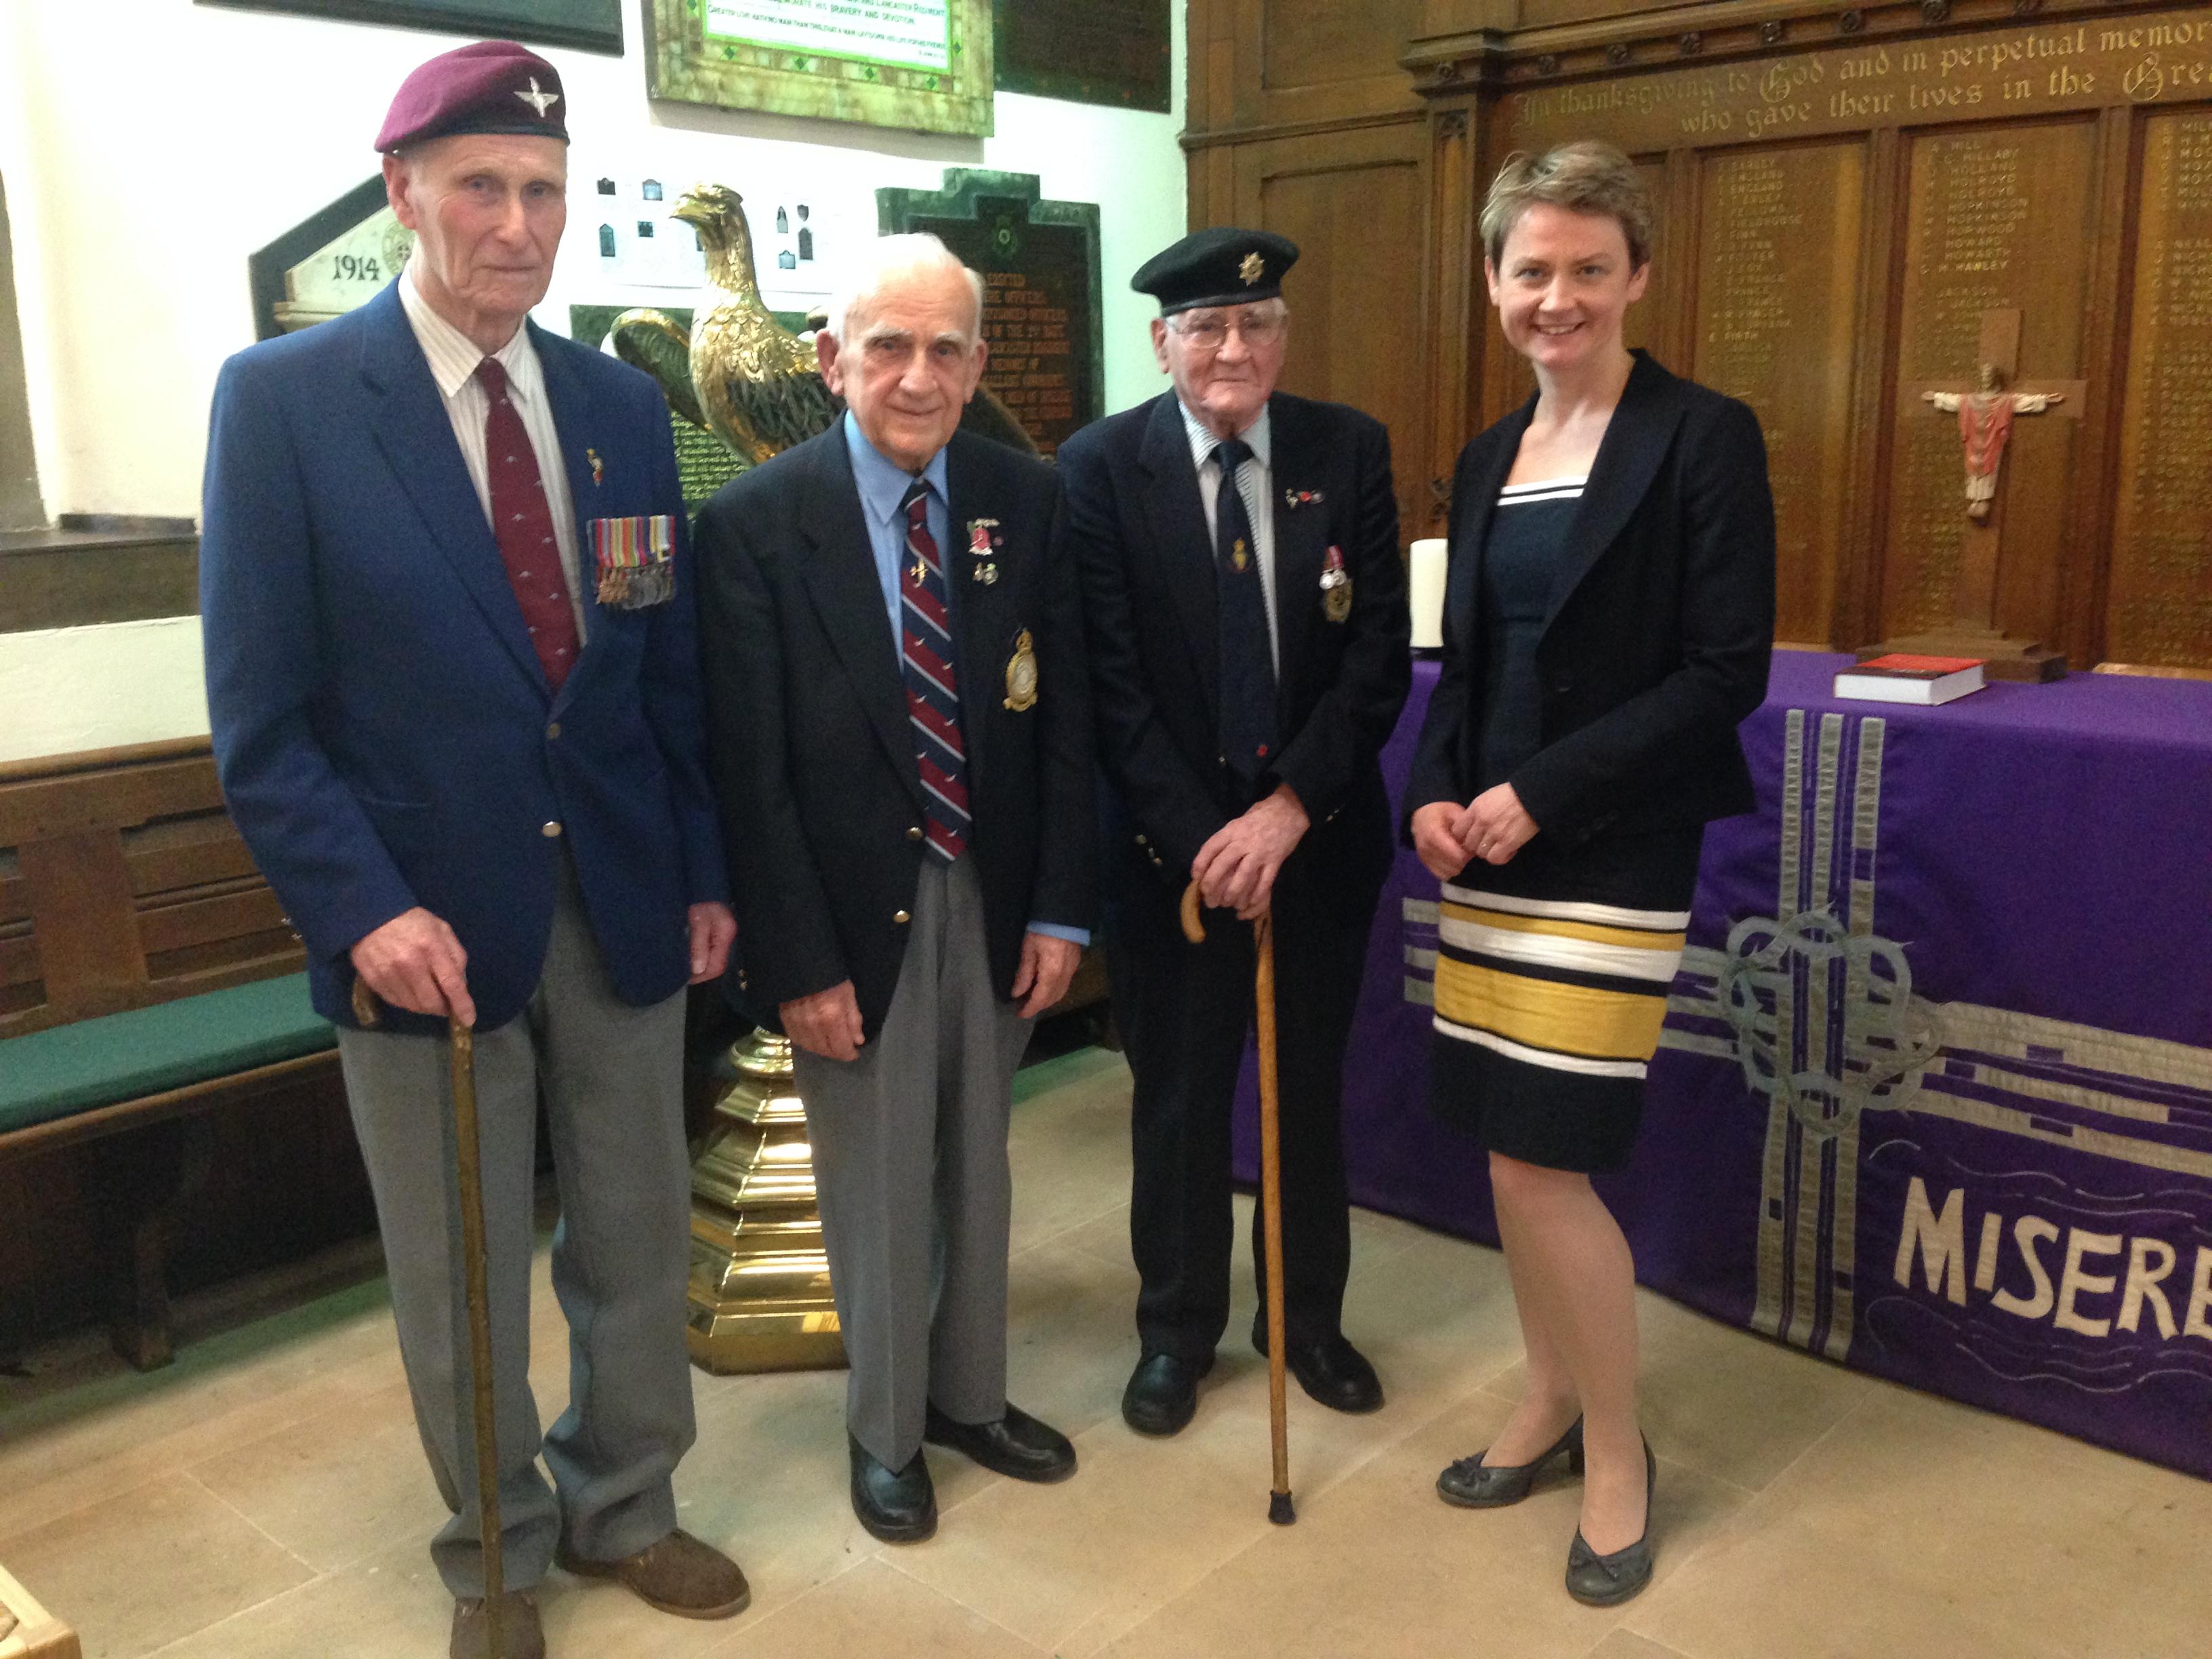 Yvette with WW2 veterans